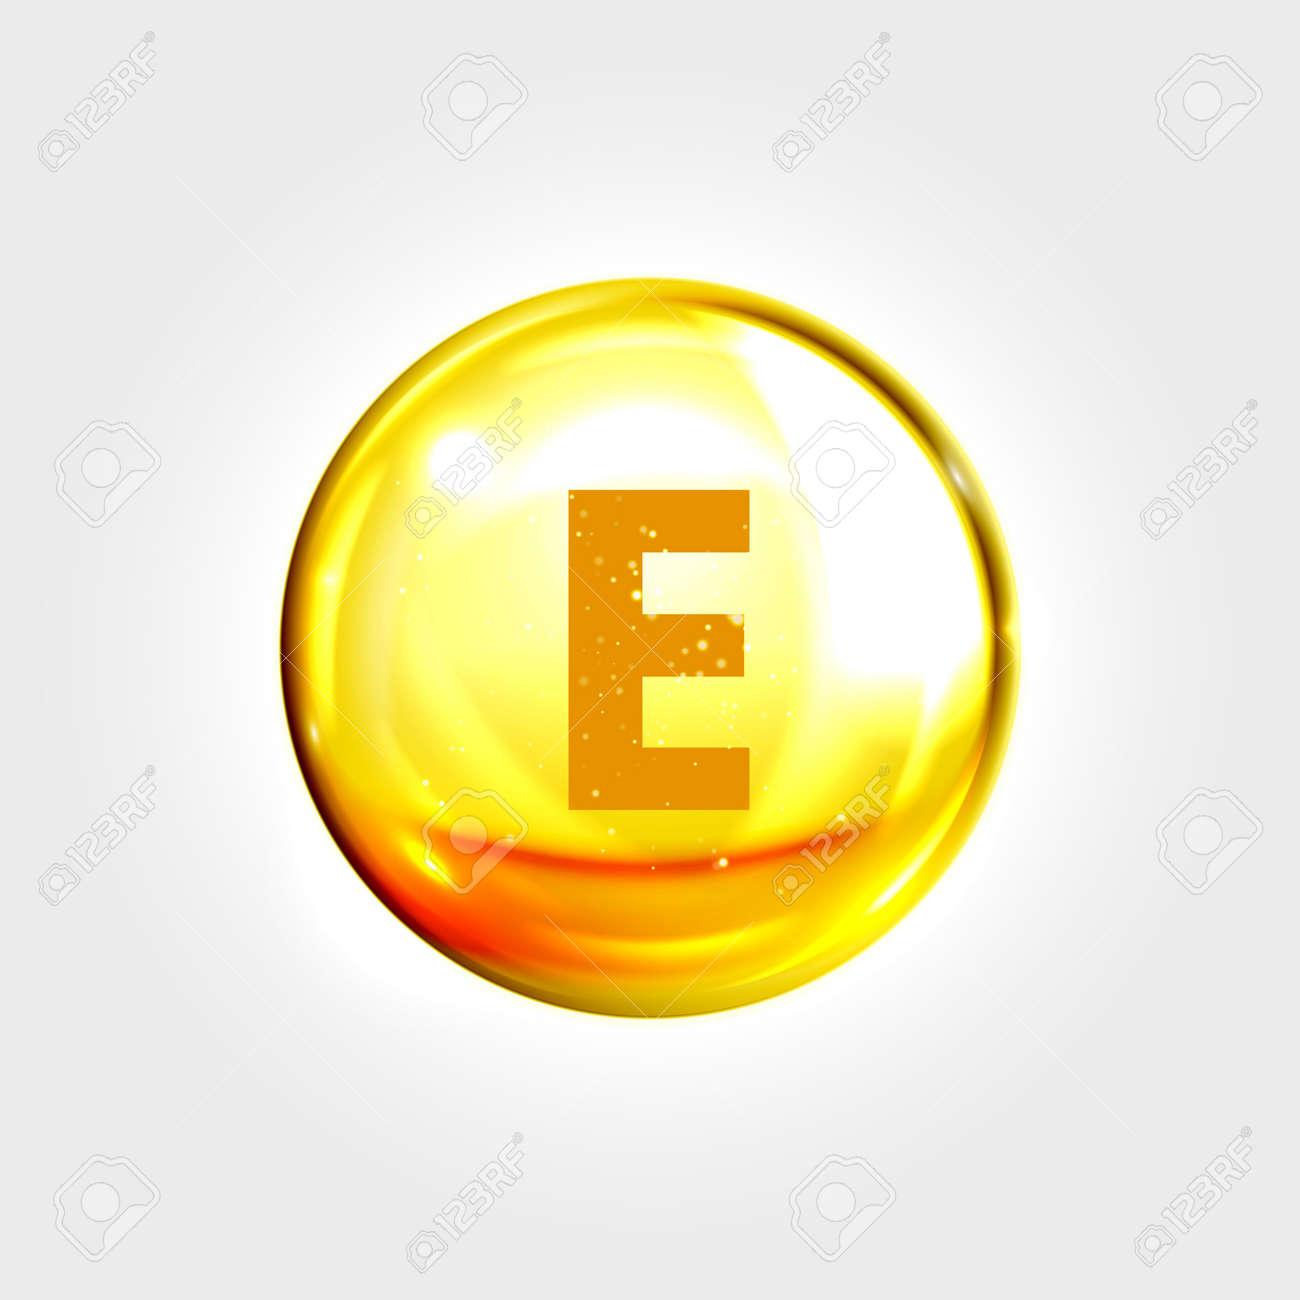 Vitamin E gold icon. Vitamin tocopherol (tocotrienol) drop pill capsule. Vector shining golden essence droplet. Beauty treatment nutrition skin care design - 61894396